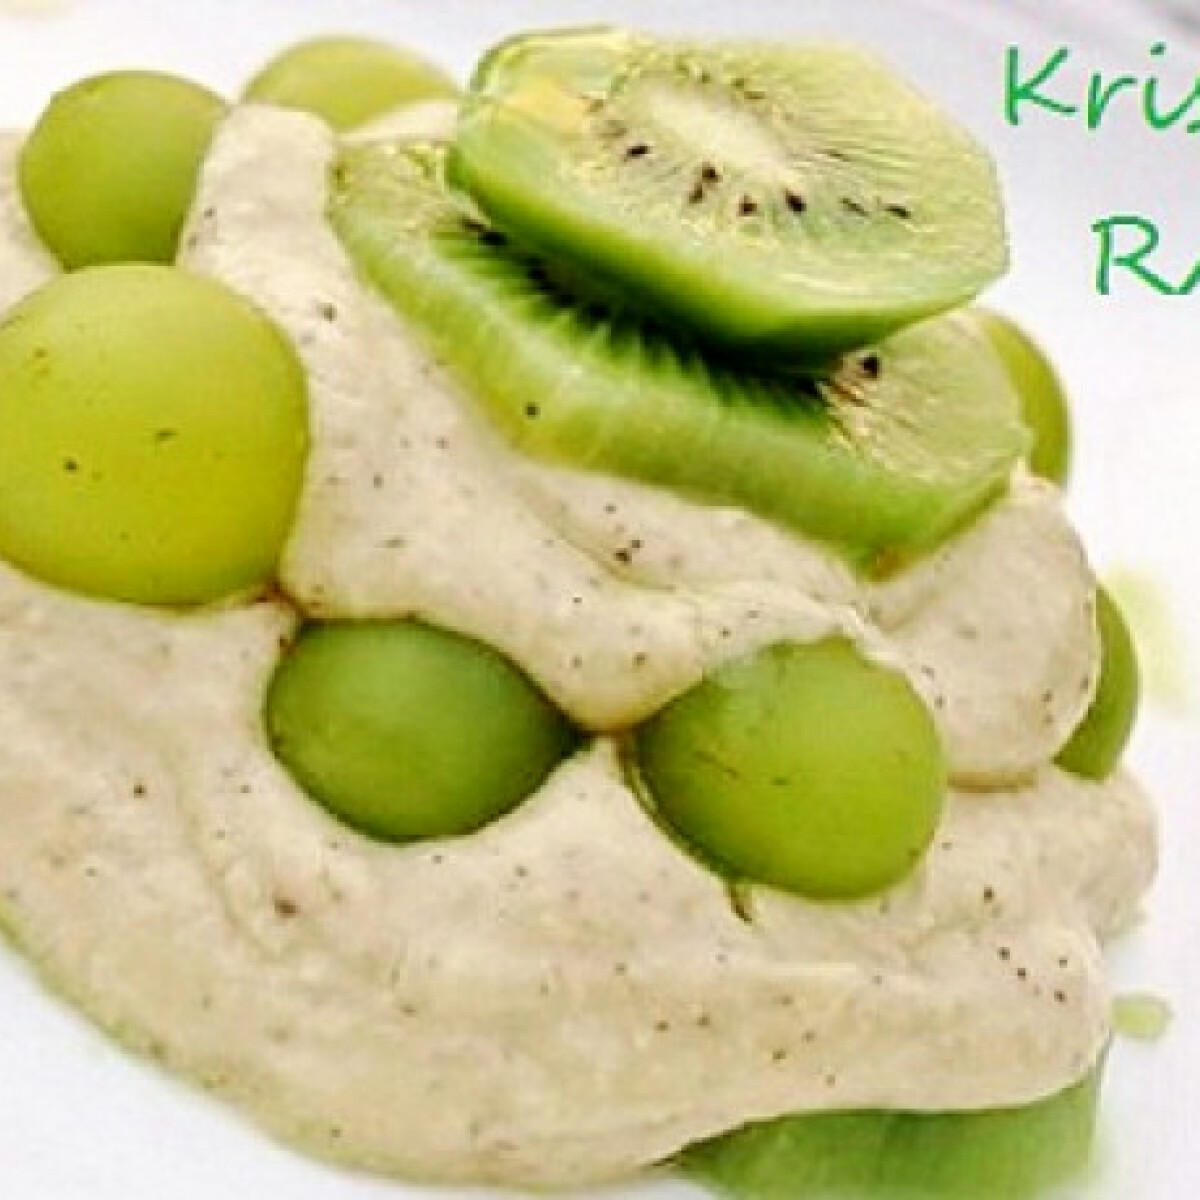 Vitamindús tejmentes kivijoghurt